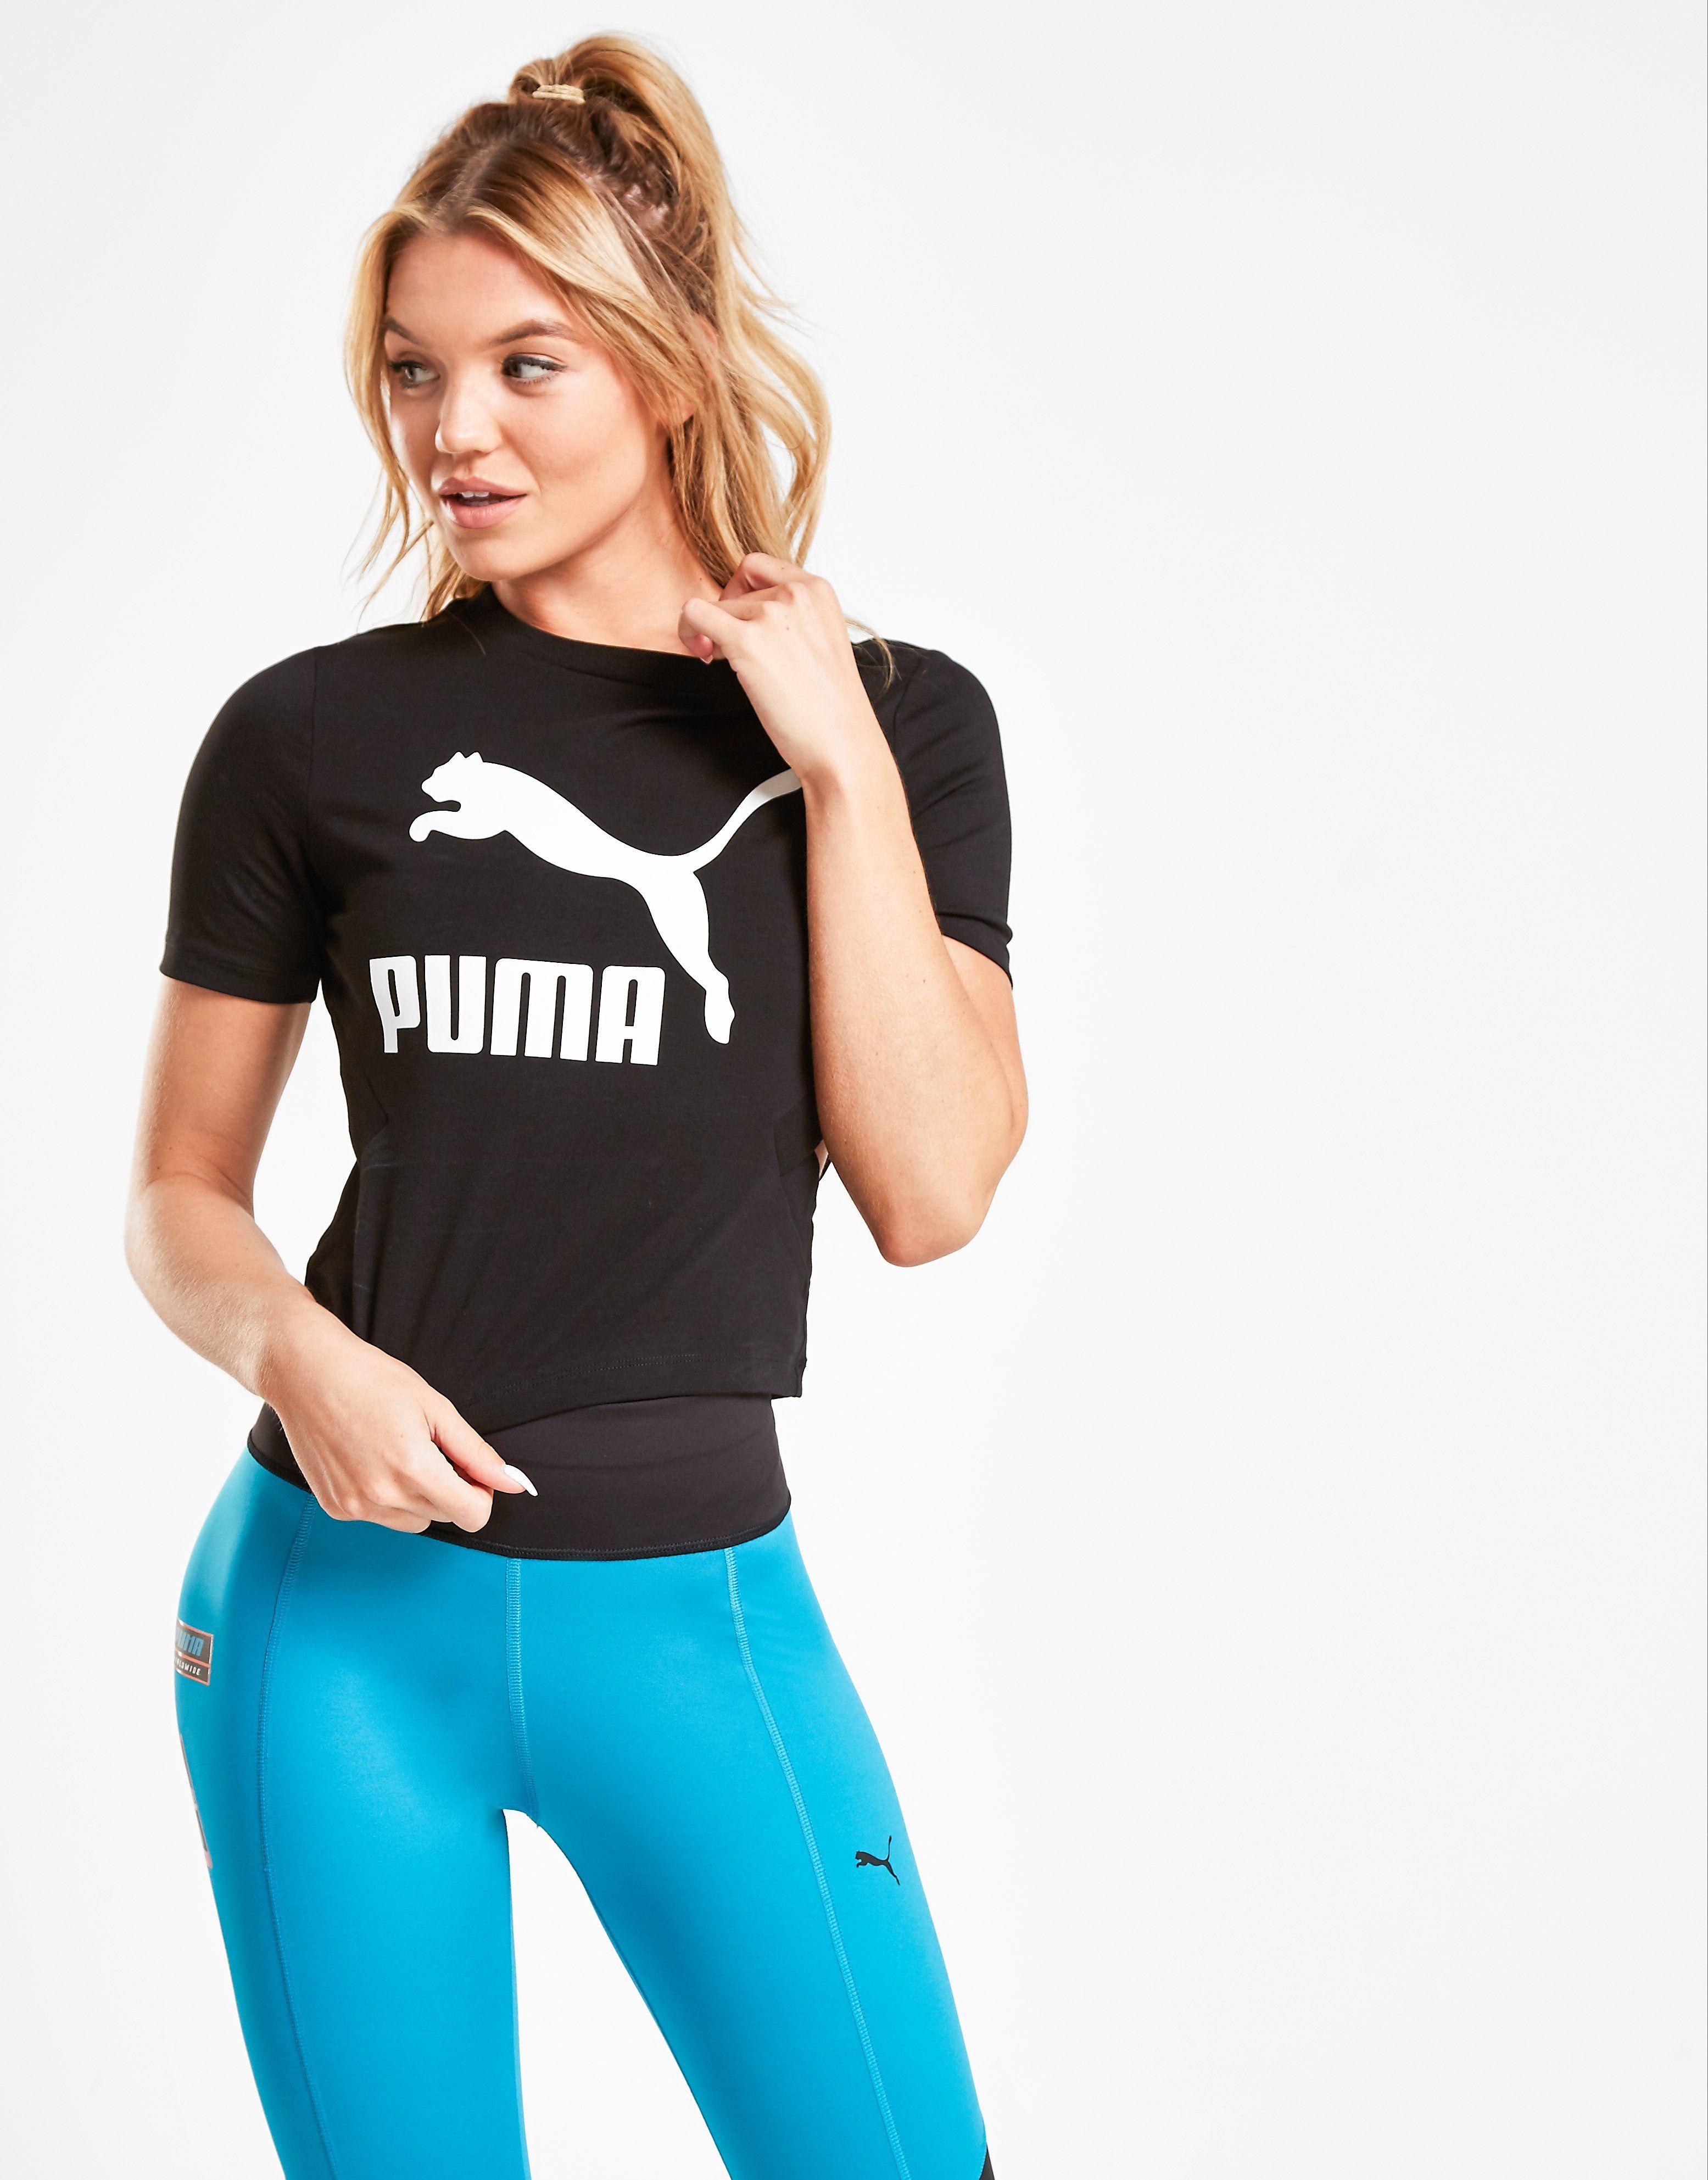 PUMA Classic Cut Out T-Shirt